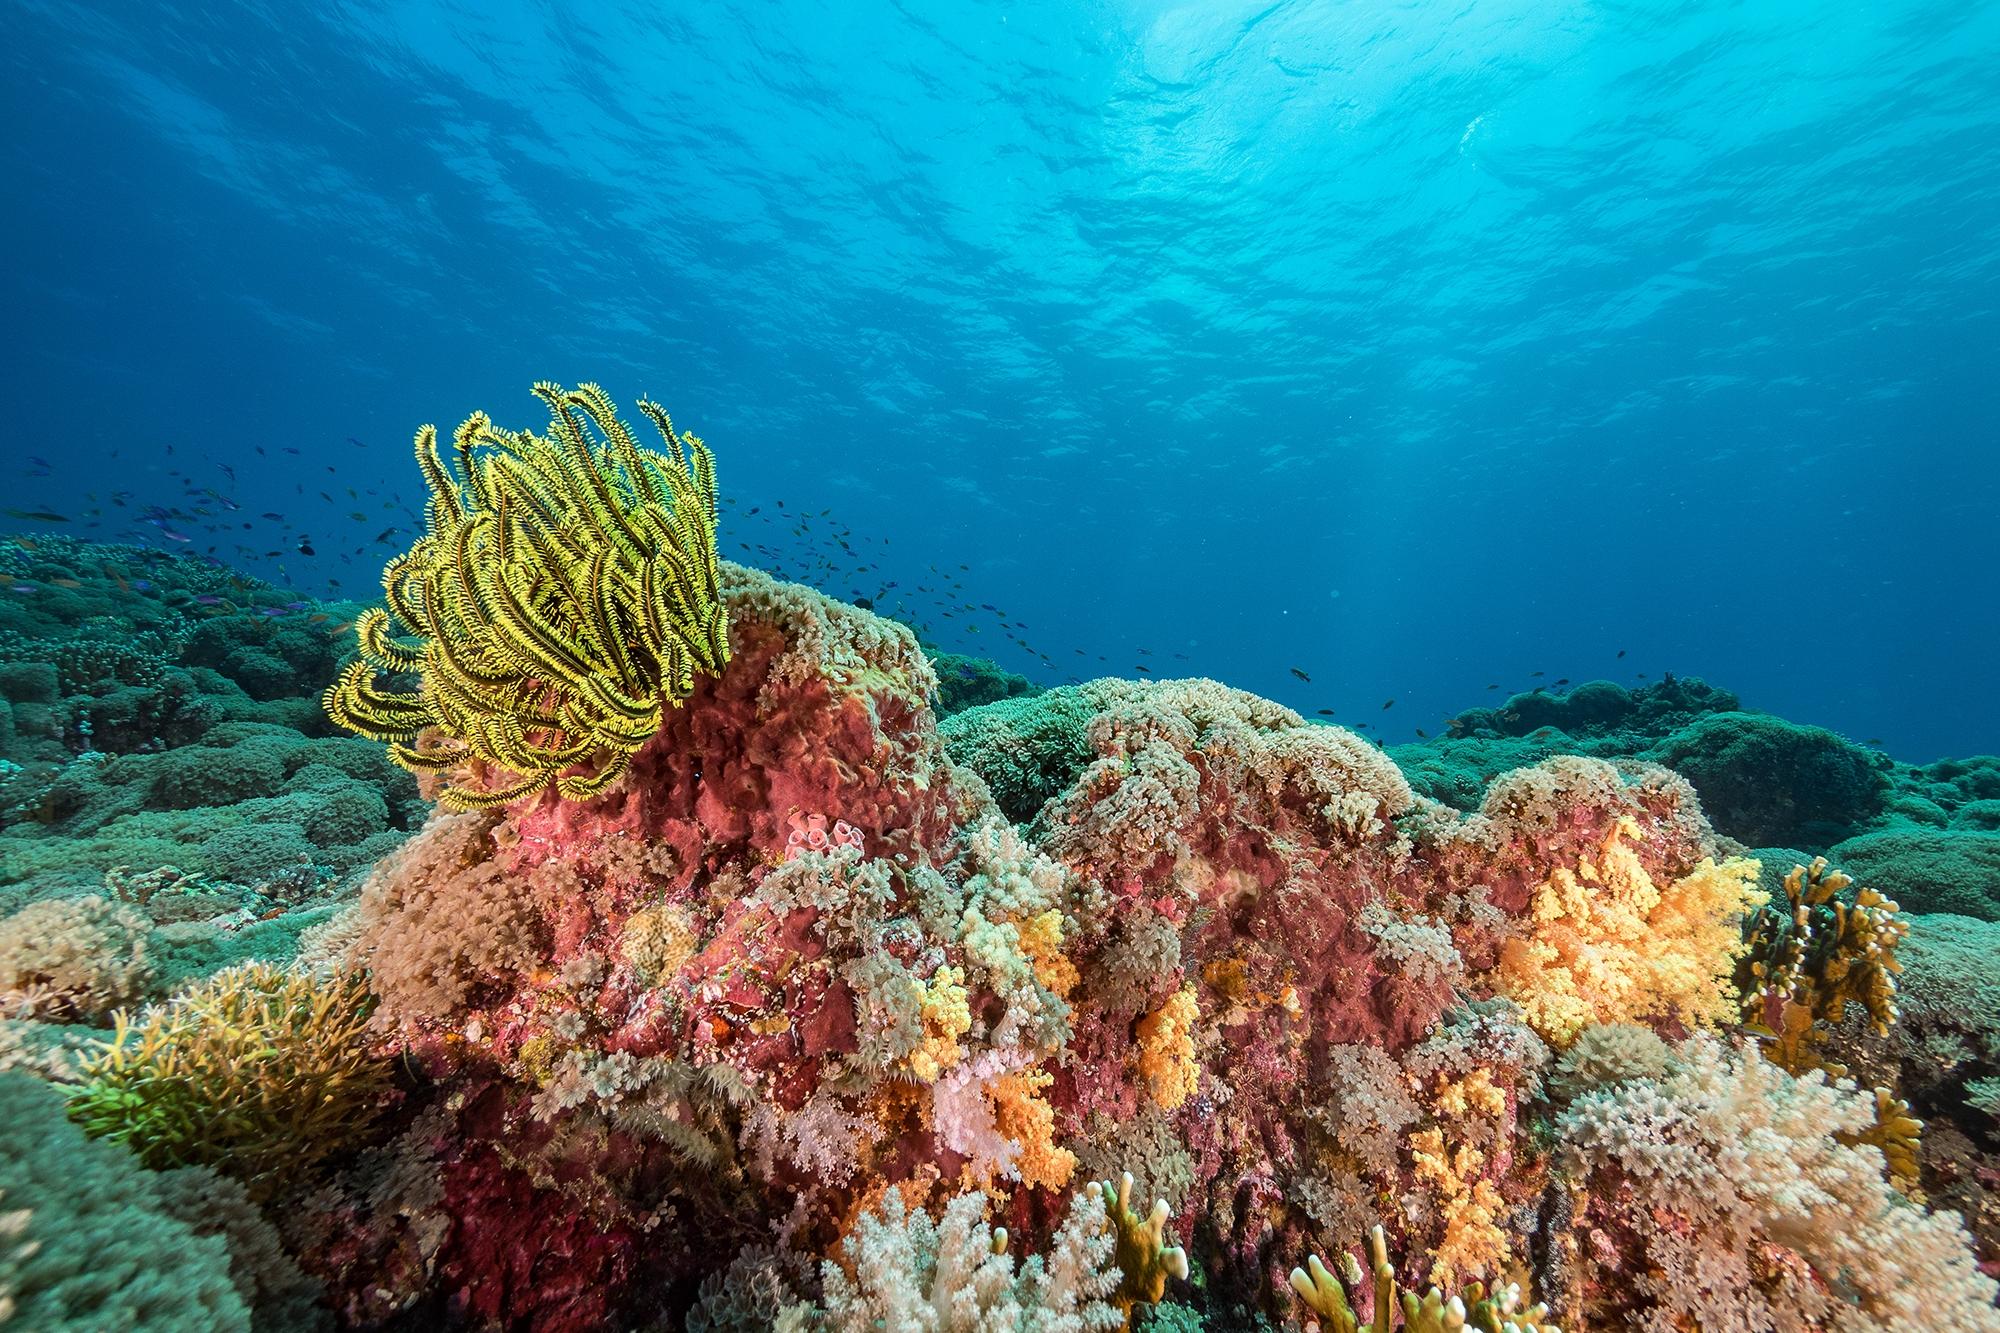 TUBBATAHA REEFS NATURAL PARK, PHILIPPINES CREDIT: SIMON J. PIERCE / coral reef image bank